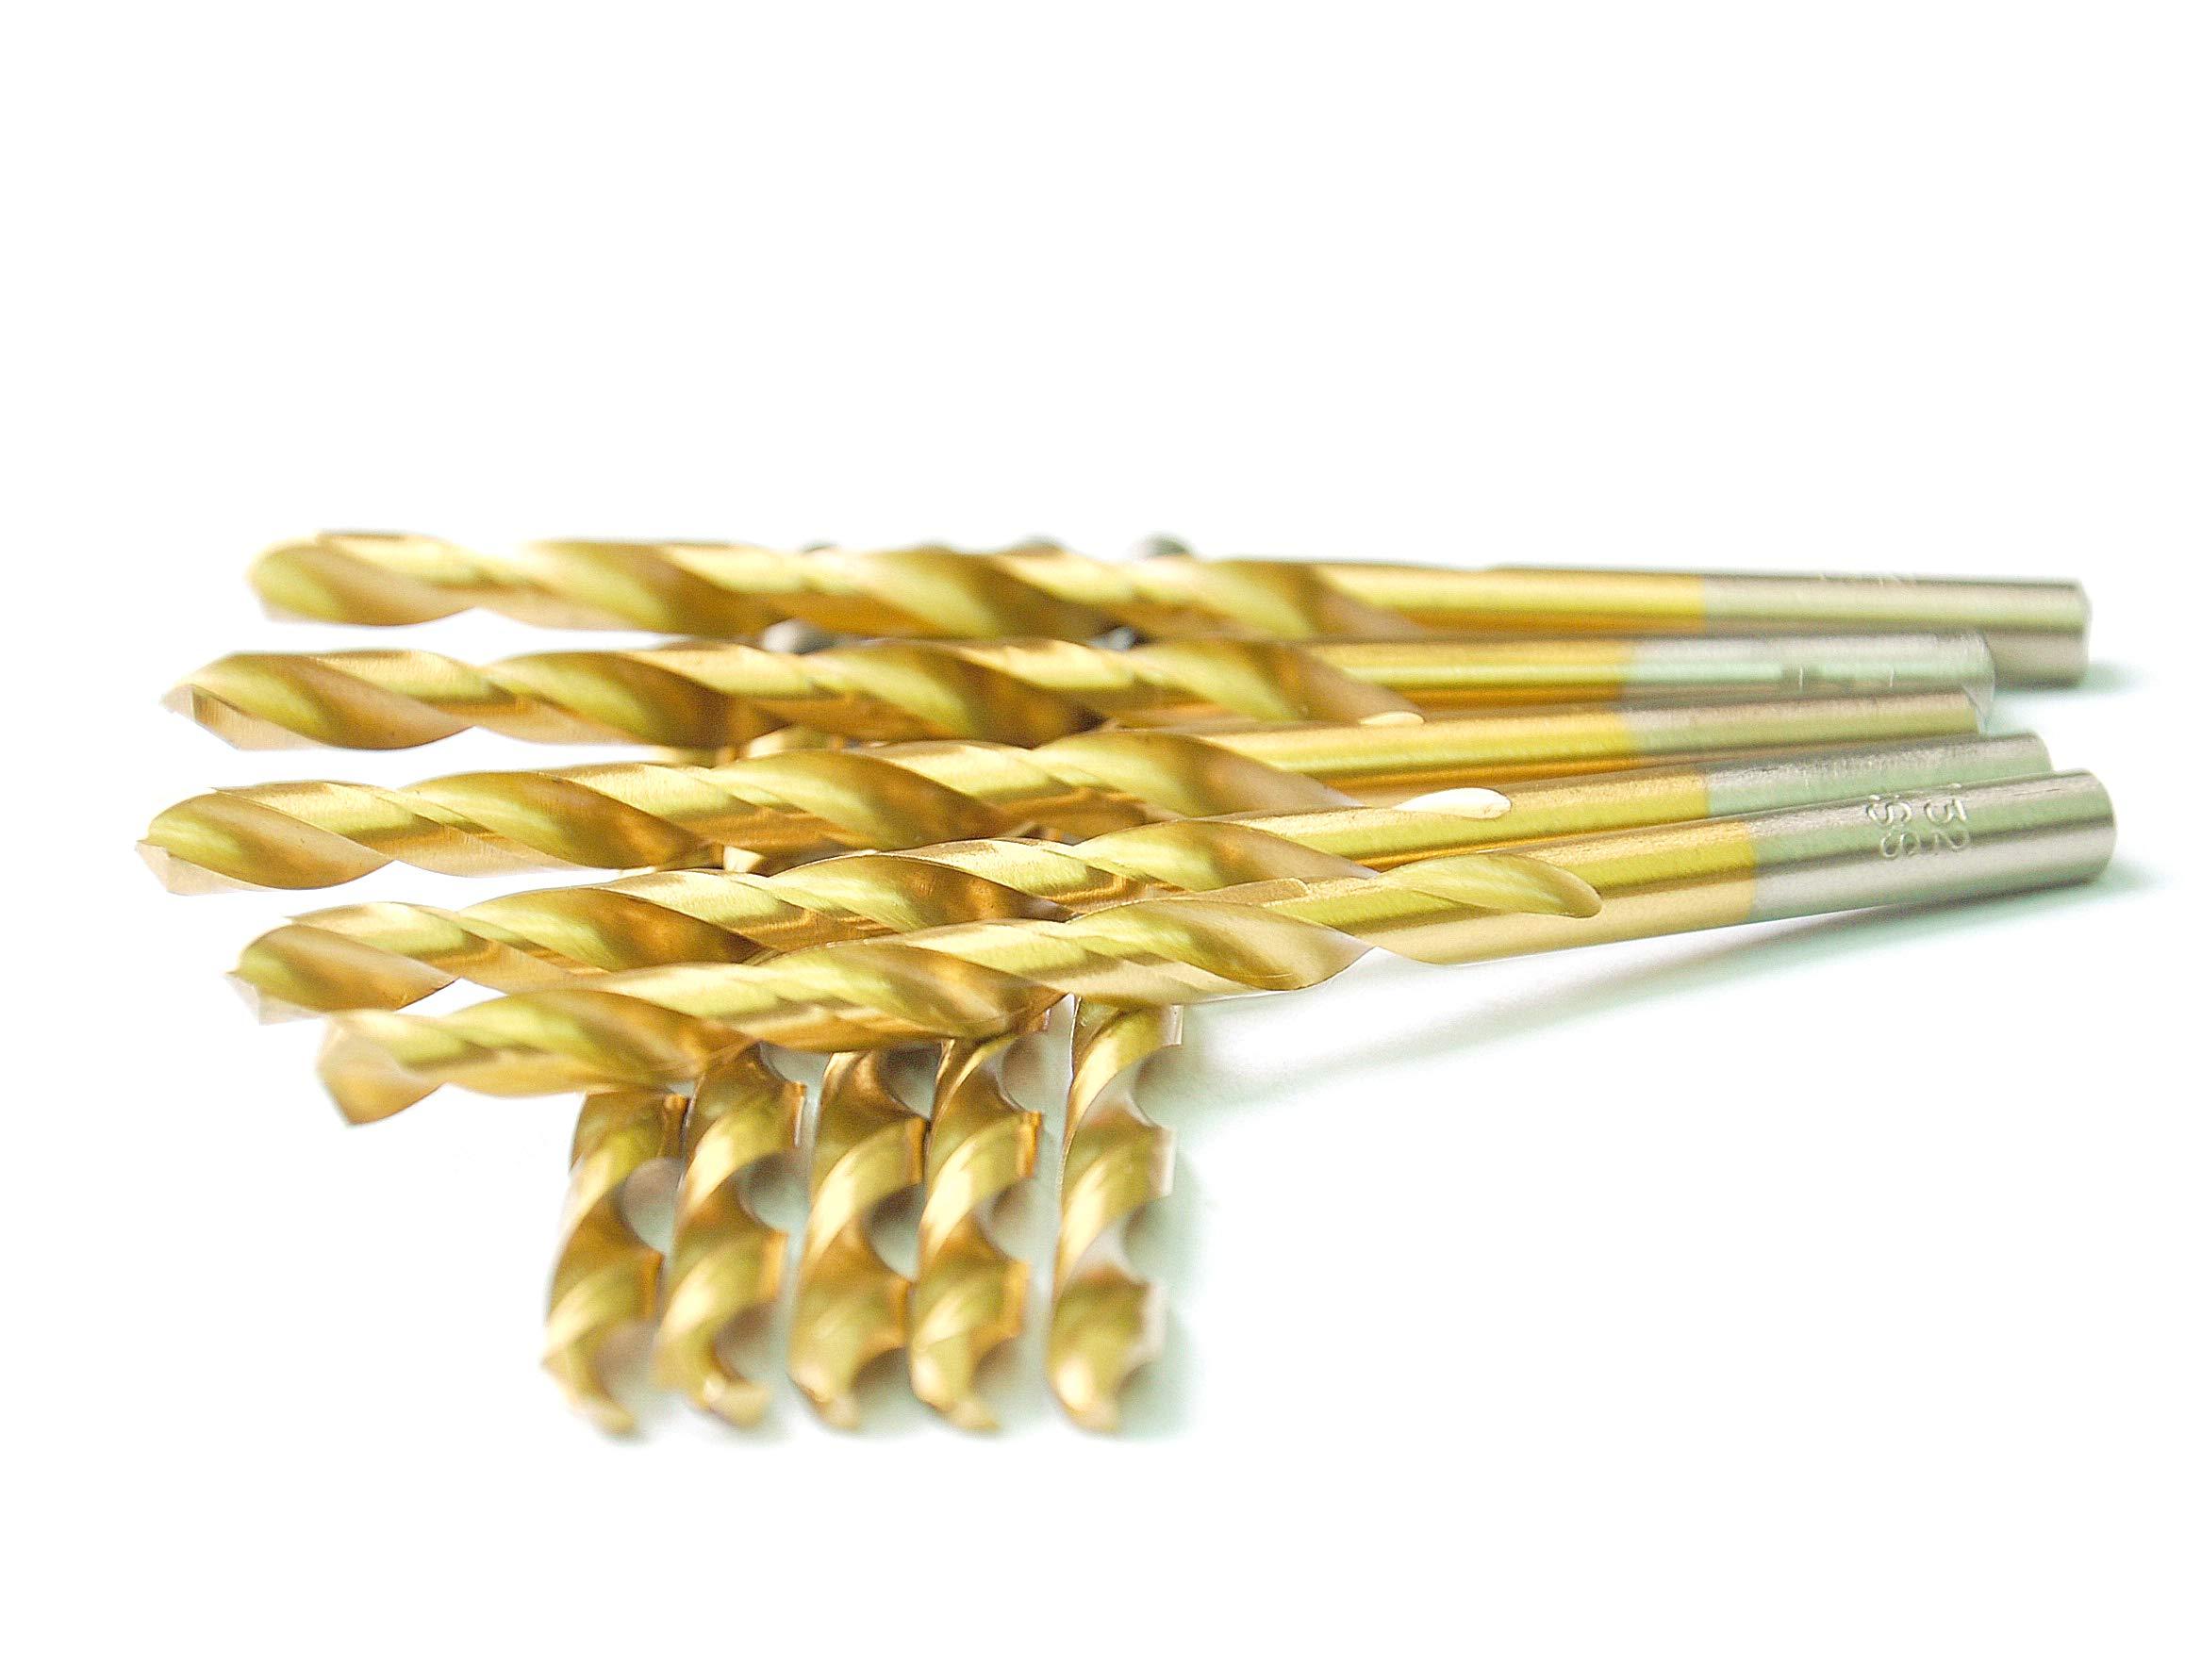 DRILLFORCE HSS Jobber Length 10 PCS,3/16'' x 3-1/2''Titanium Coated Twist Drill Bits, Metal drill, ideal for drilling on mild steel, copper, Aluminum, Zinc alloy etc. Pack In Plastic Bag (3/16)